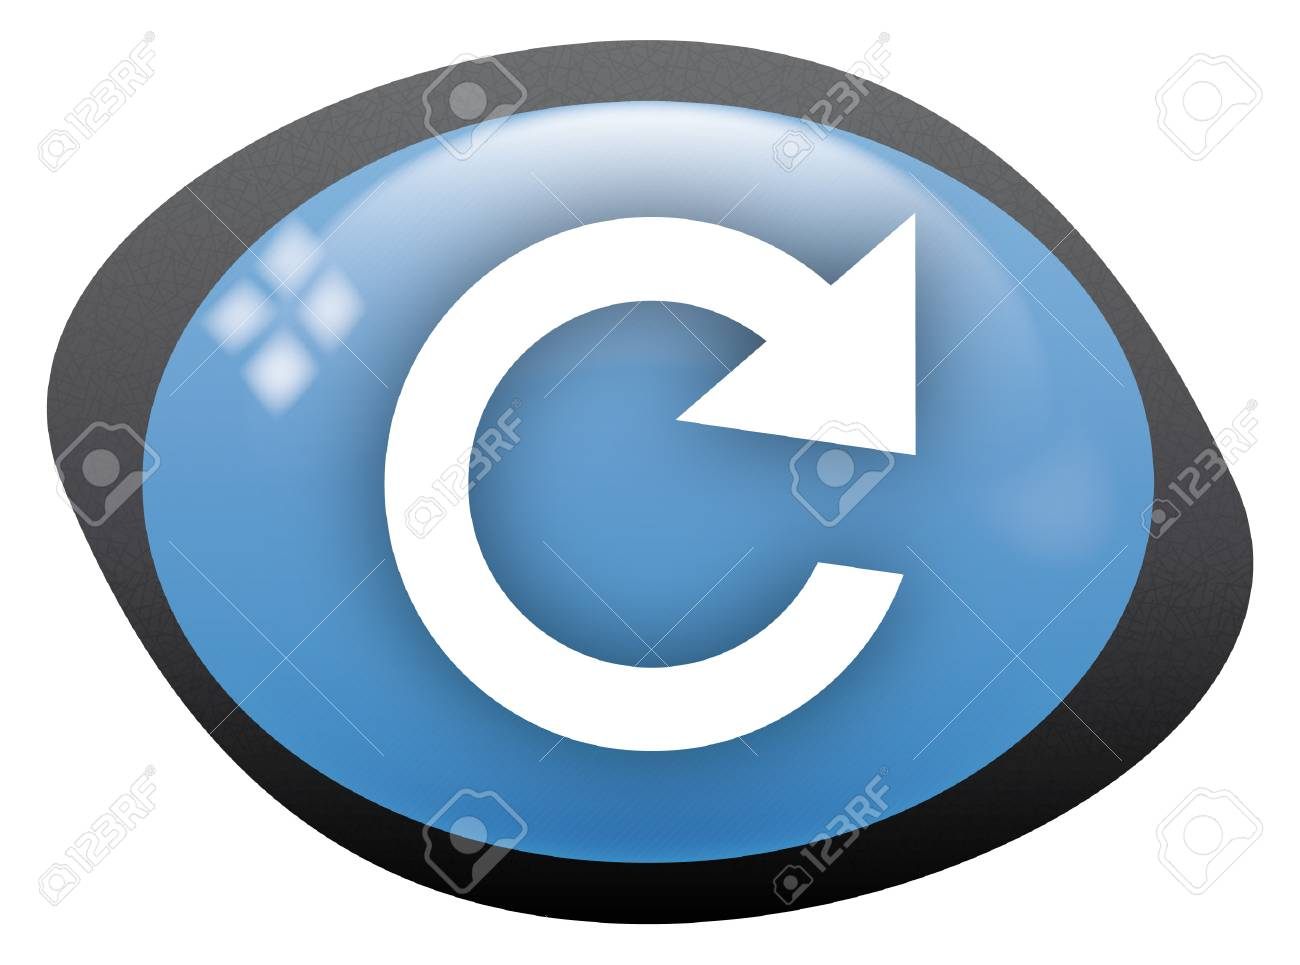 icon oval refresh Stock Vector - 8304811